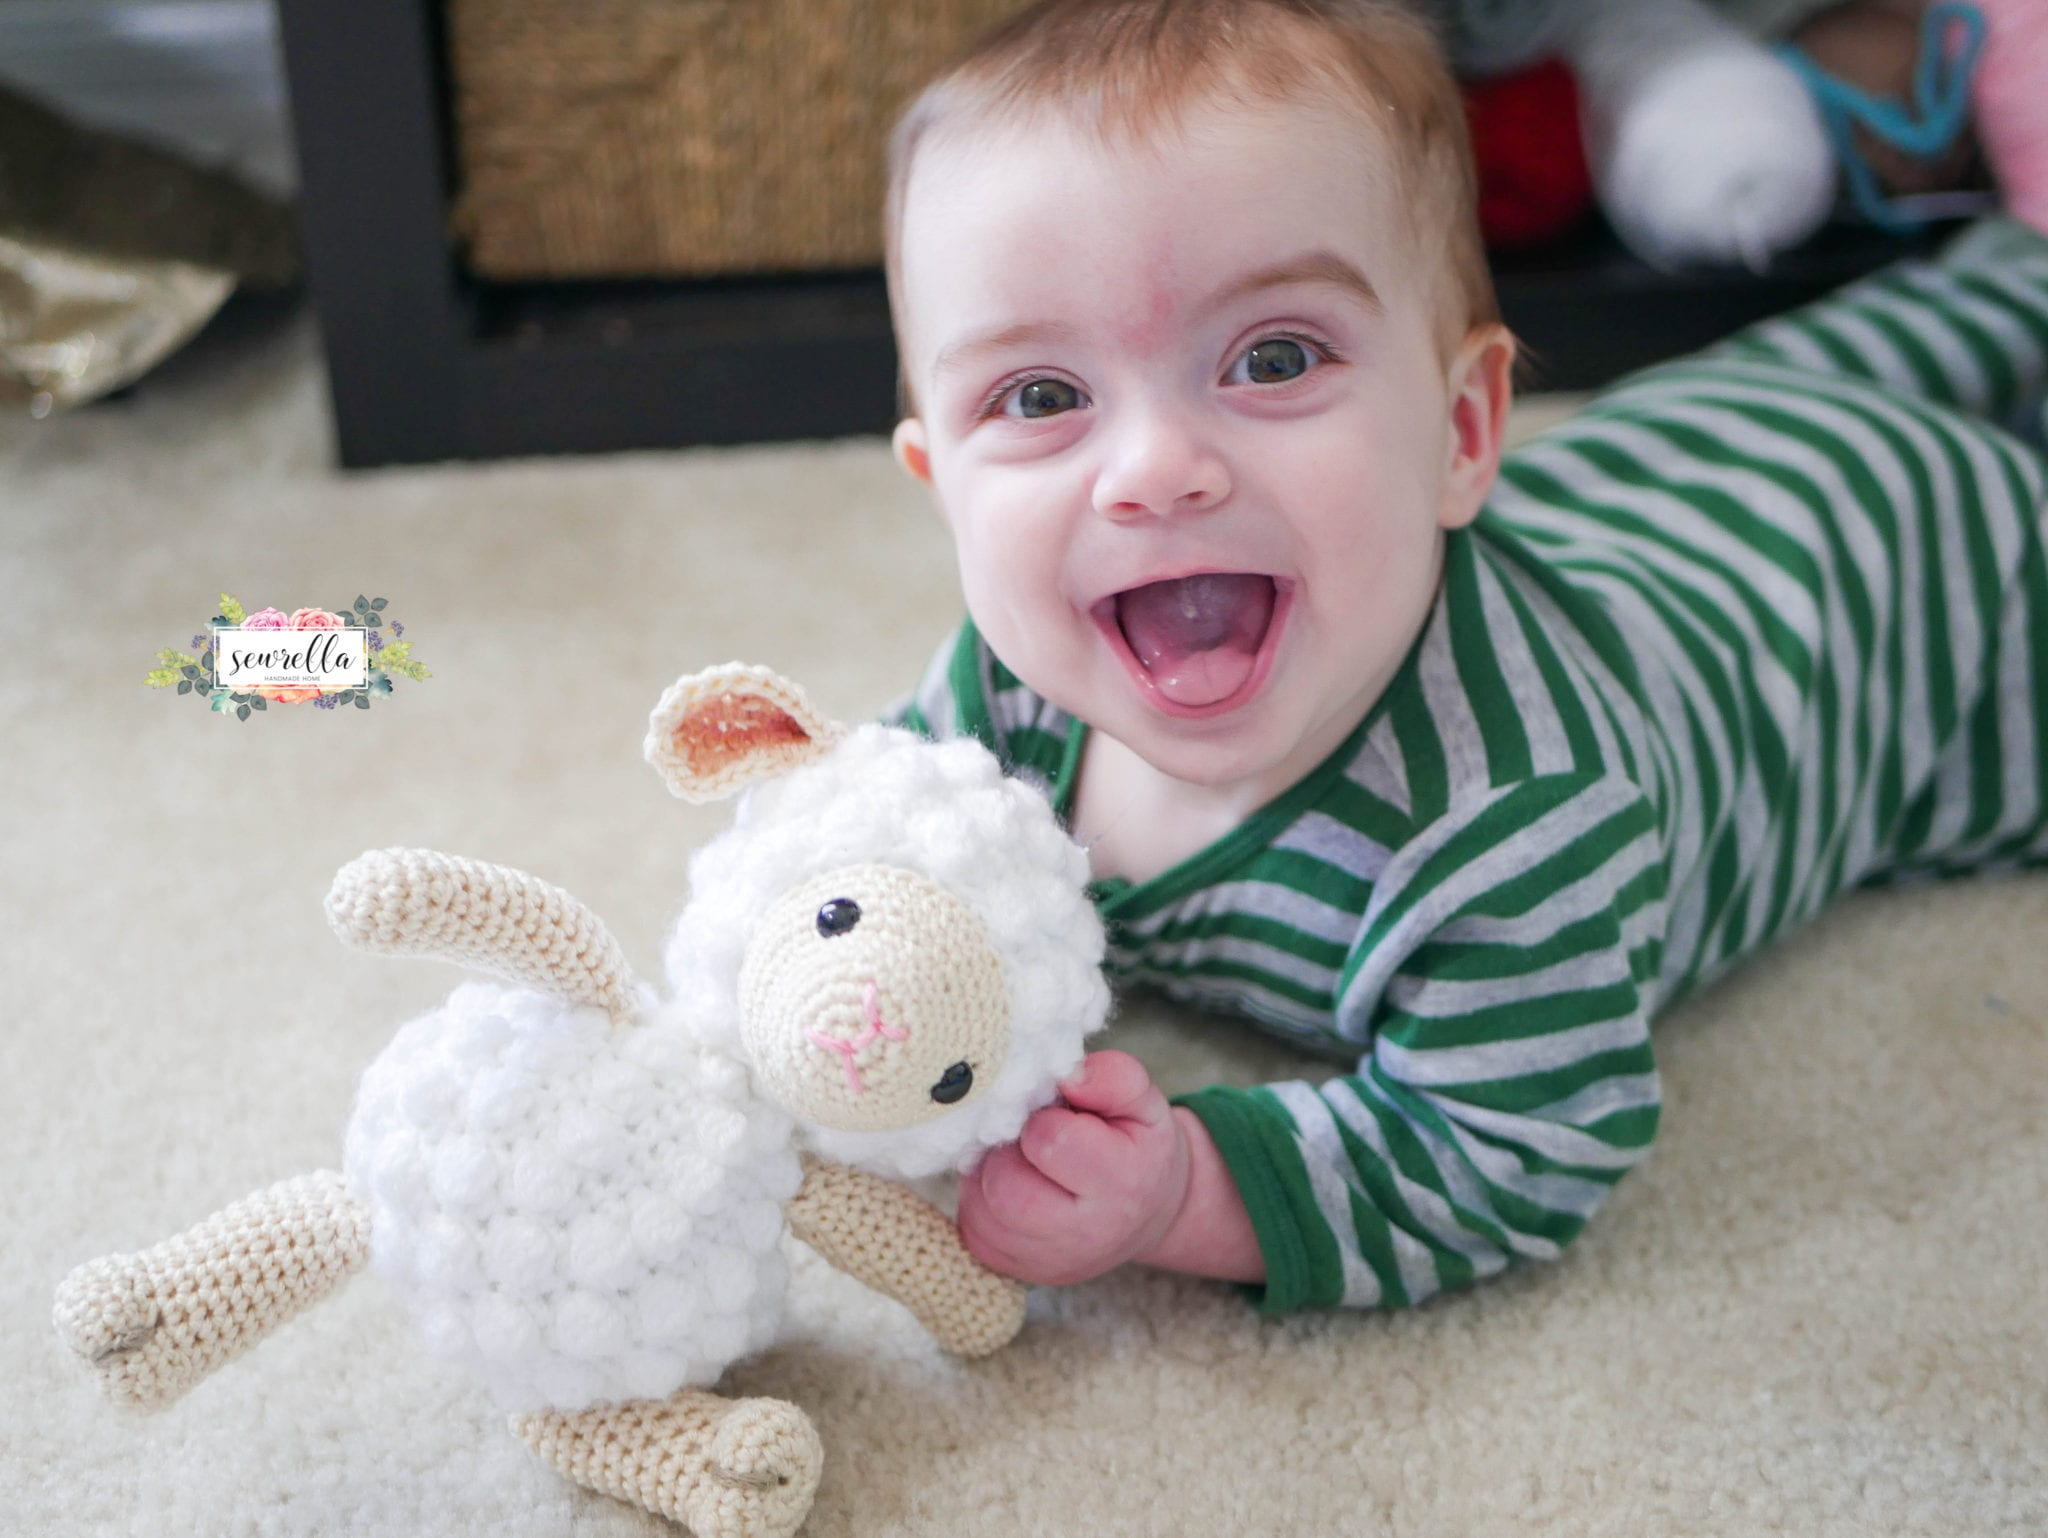 Cuddle Me Sheep amigurumi pattern - Amigurumi Today | 1538x2048